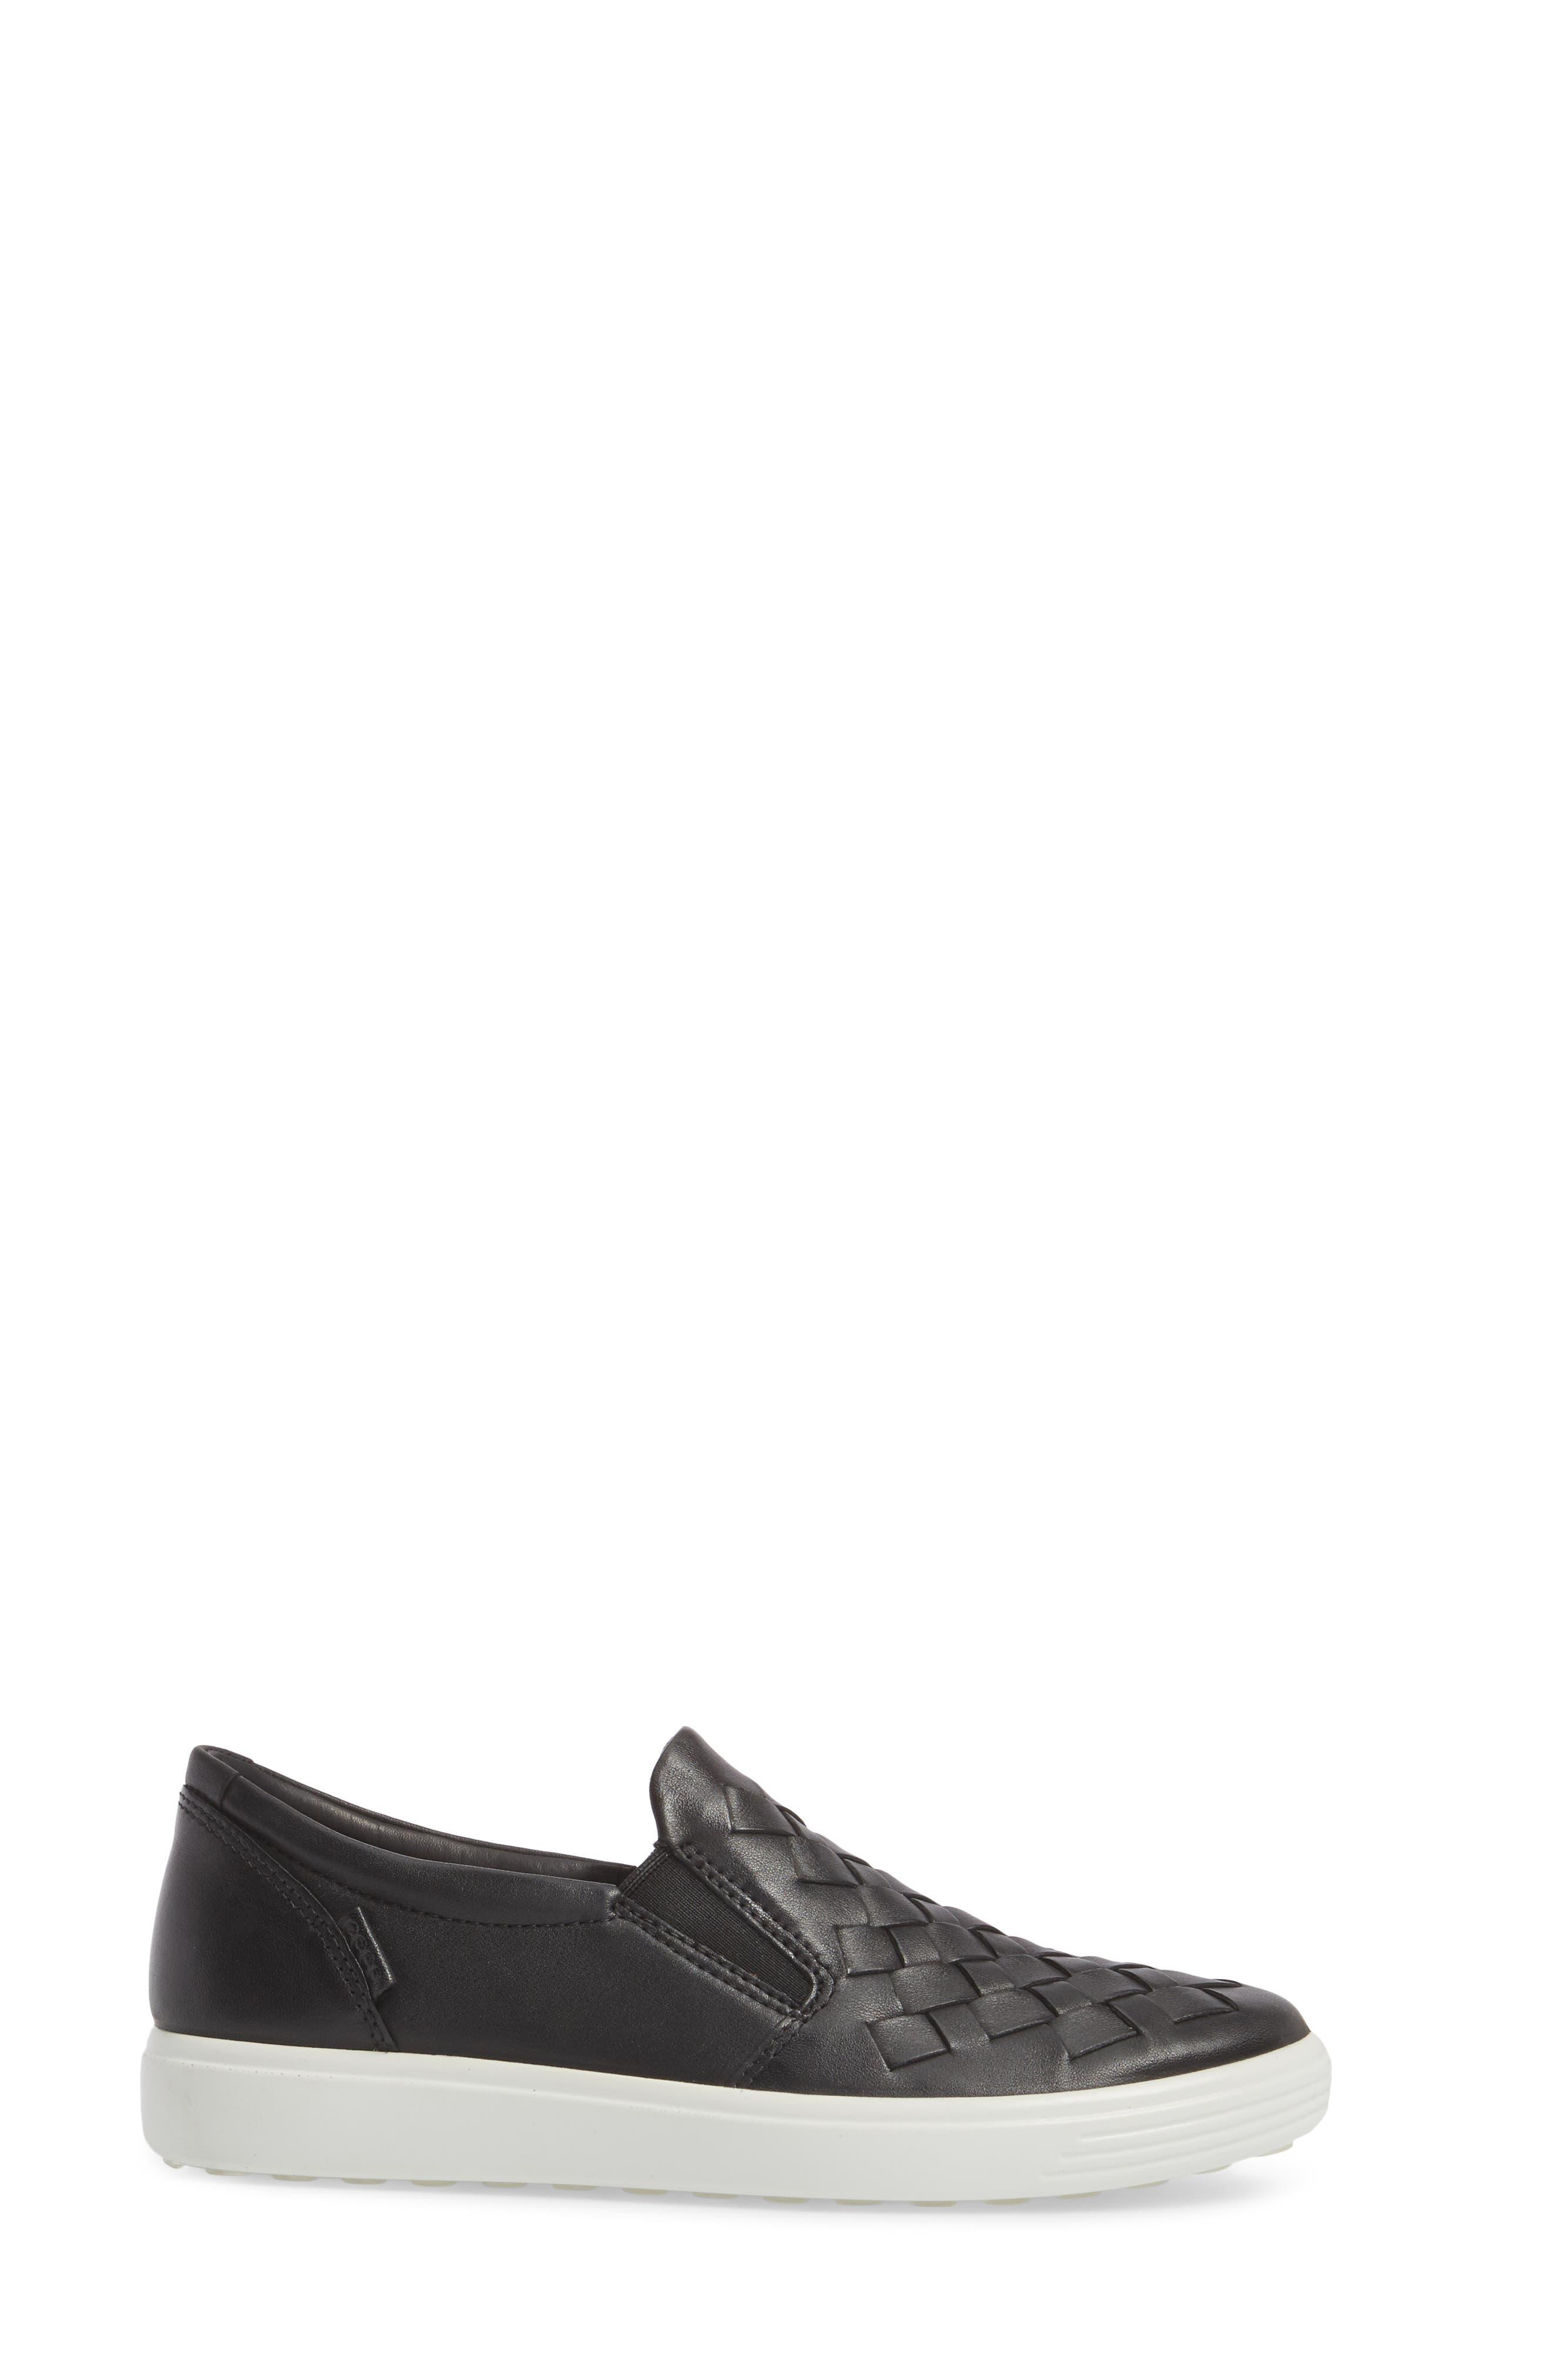 ECO Soft 7 Woven Slip-On Sneaker,                             Alternate thumbnail 3, color,                             Black Leather